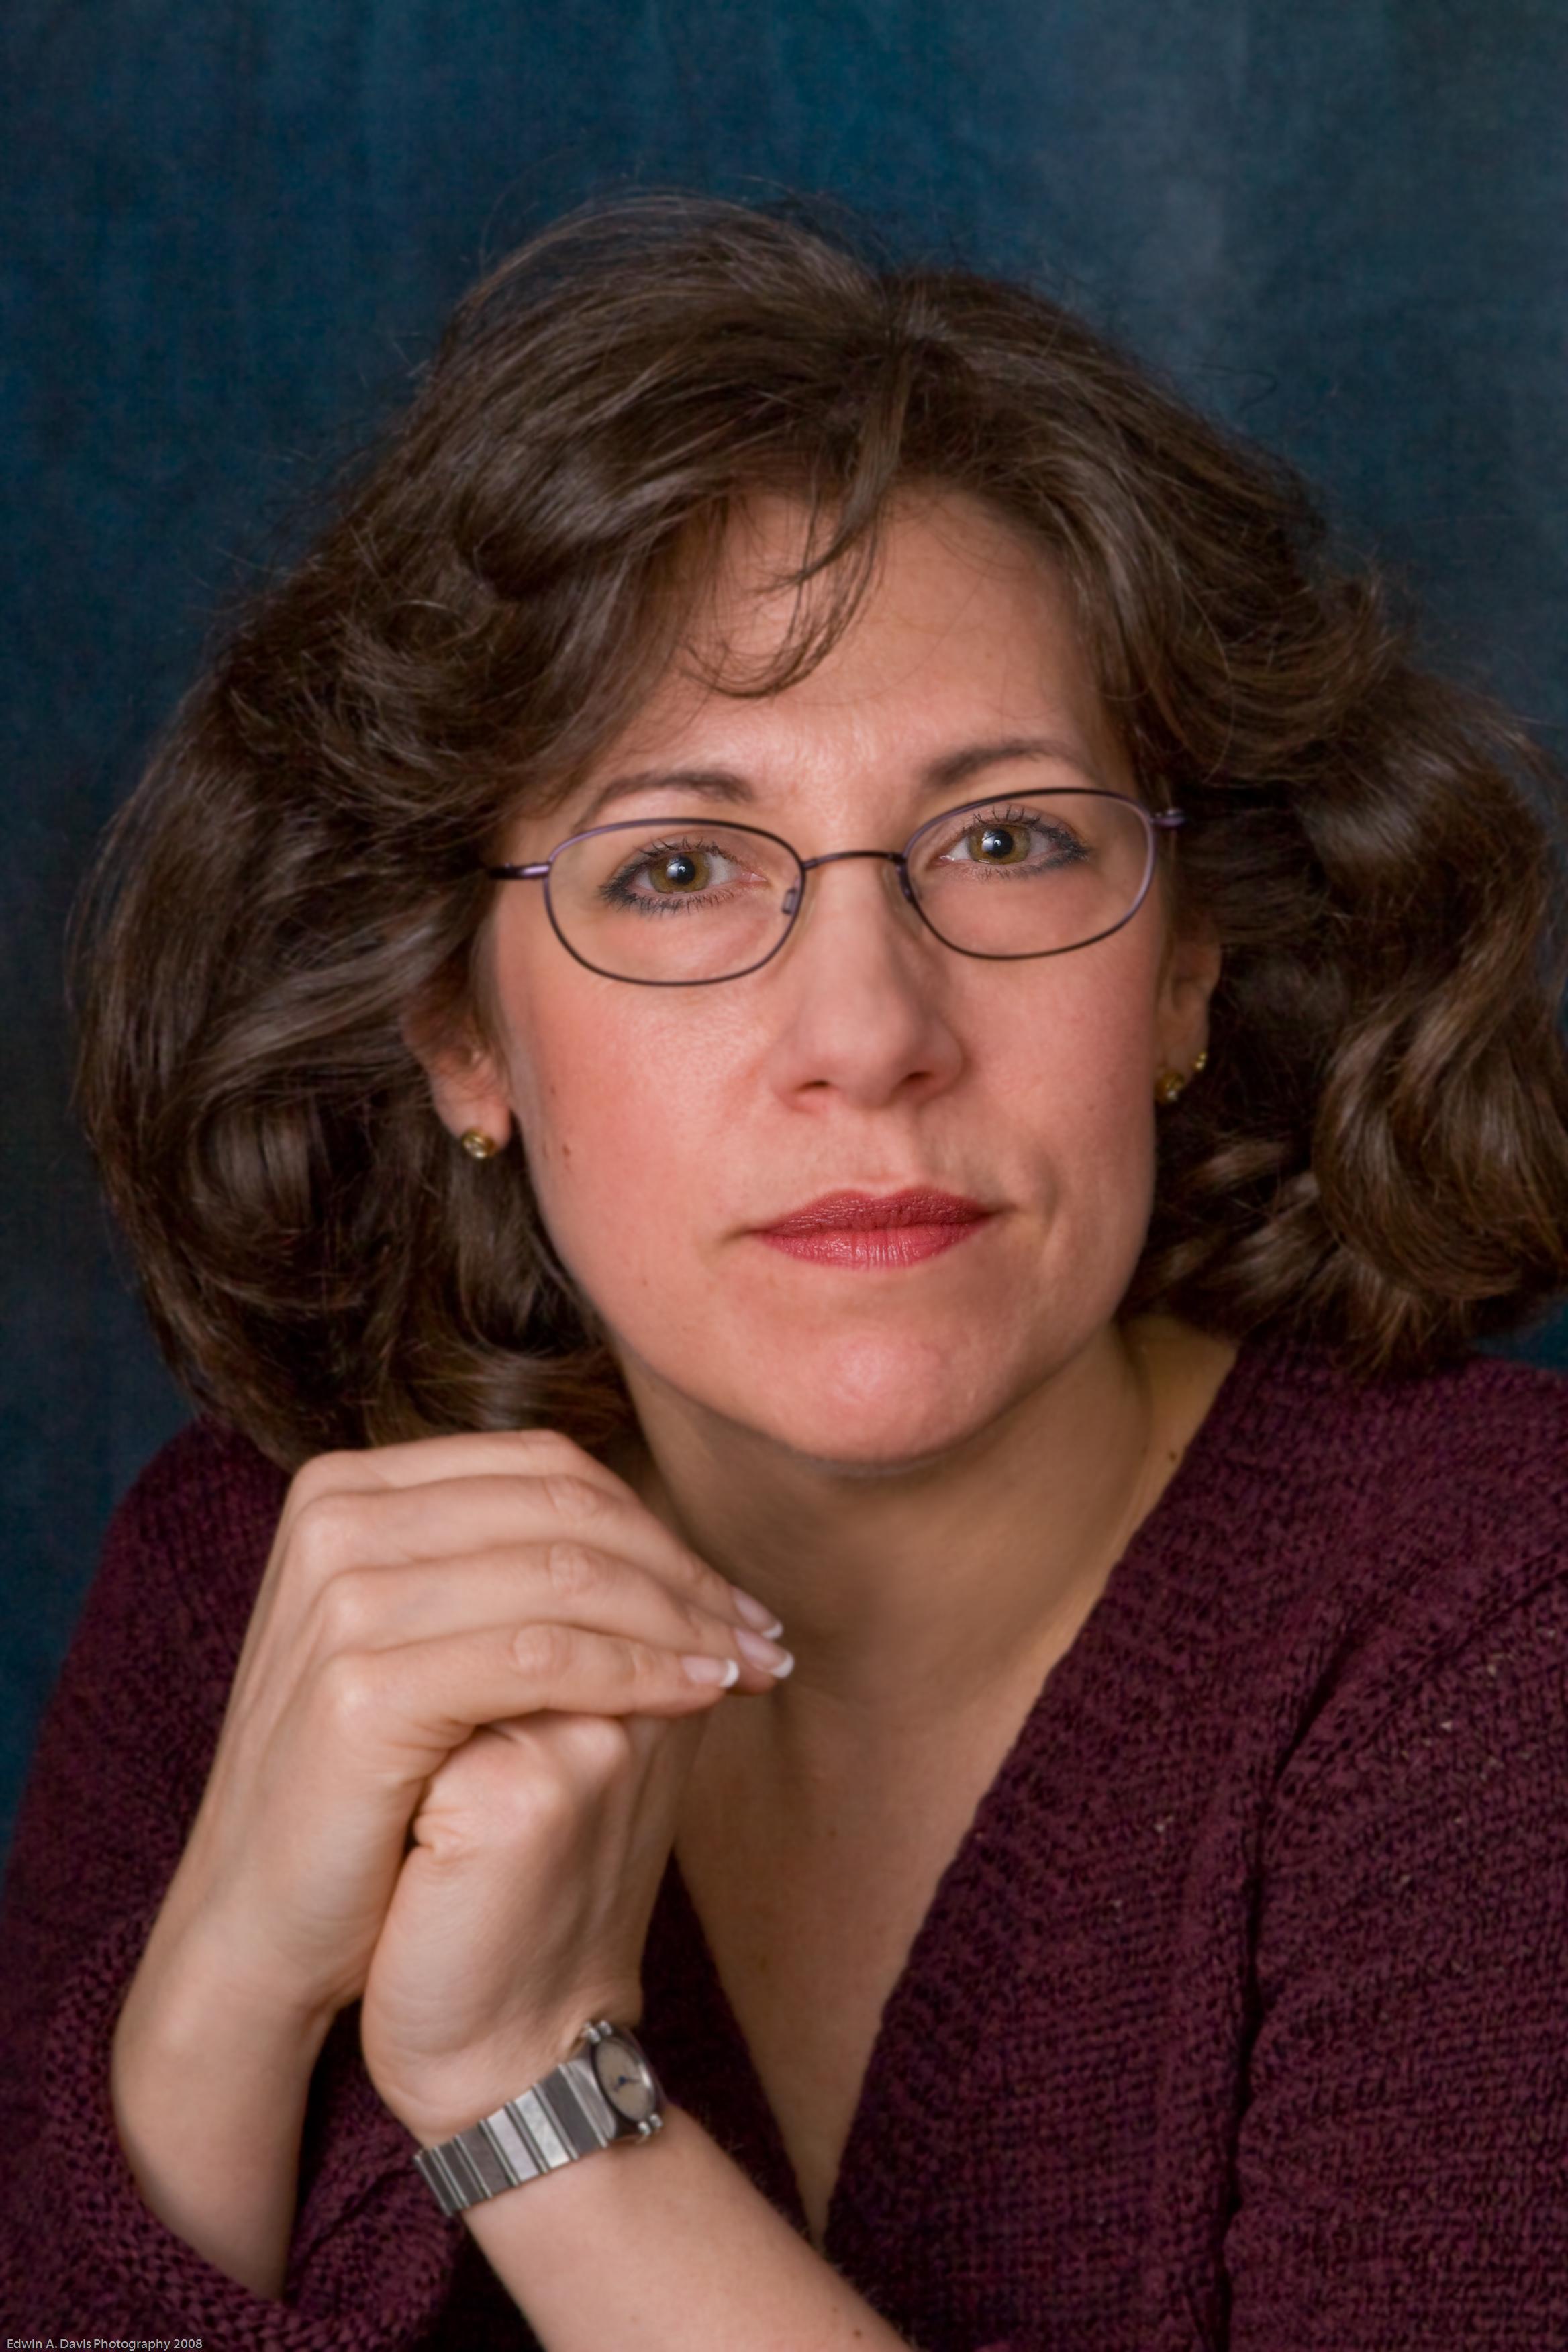 NCJW, West Morris Presented Free Workshop on Jewish Attitudes toward 'Pleasures of the Flesh'